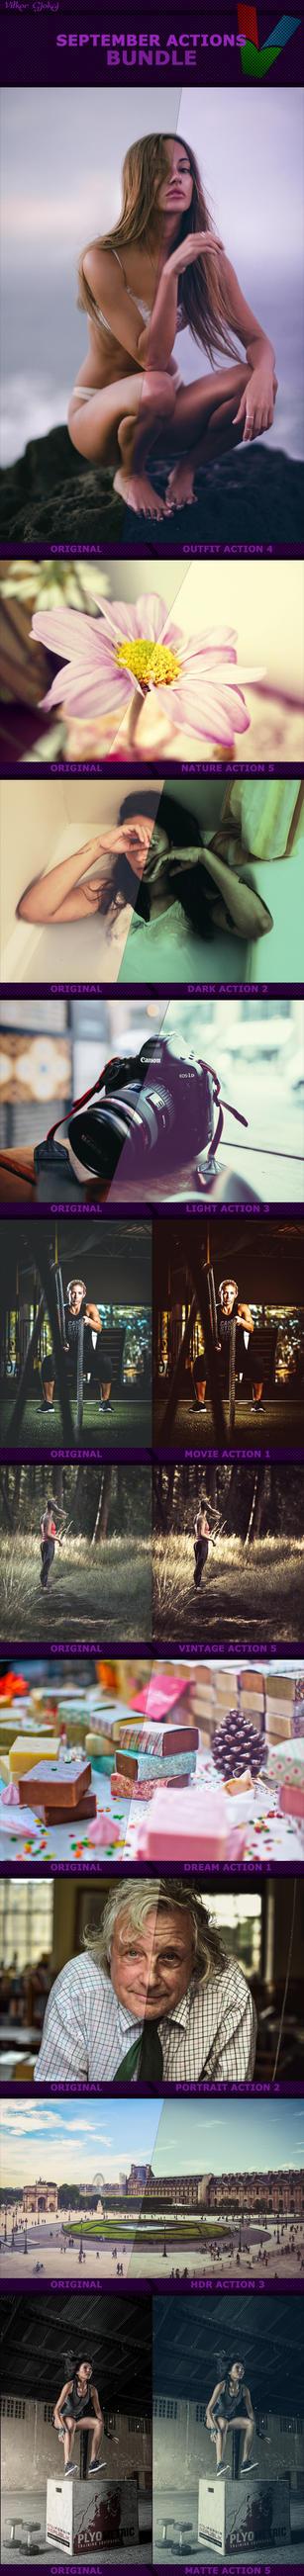 September Photoshop Actions Bundle by ViktorGjokaj